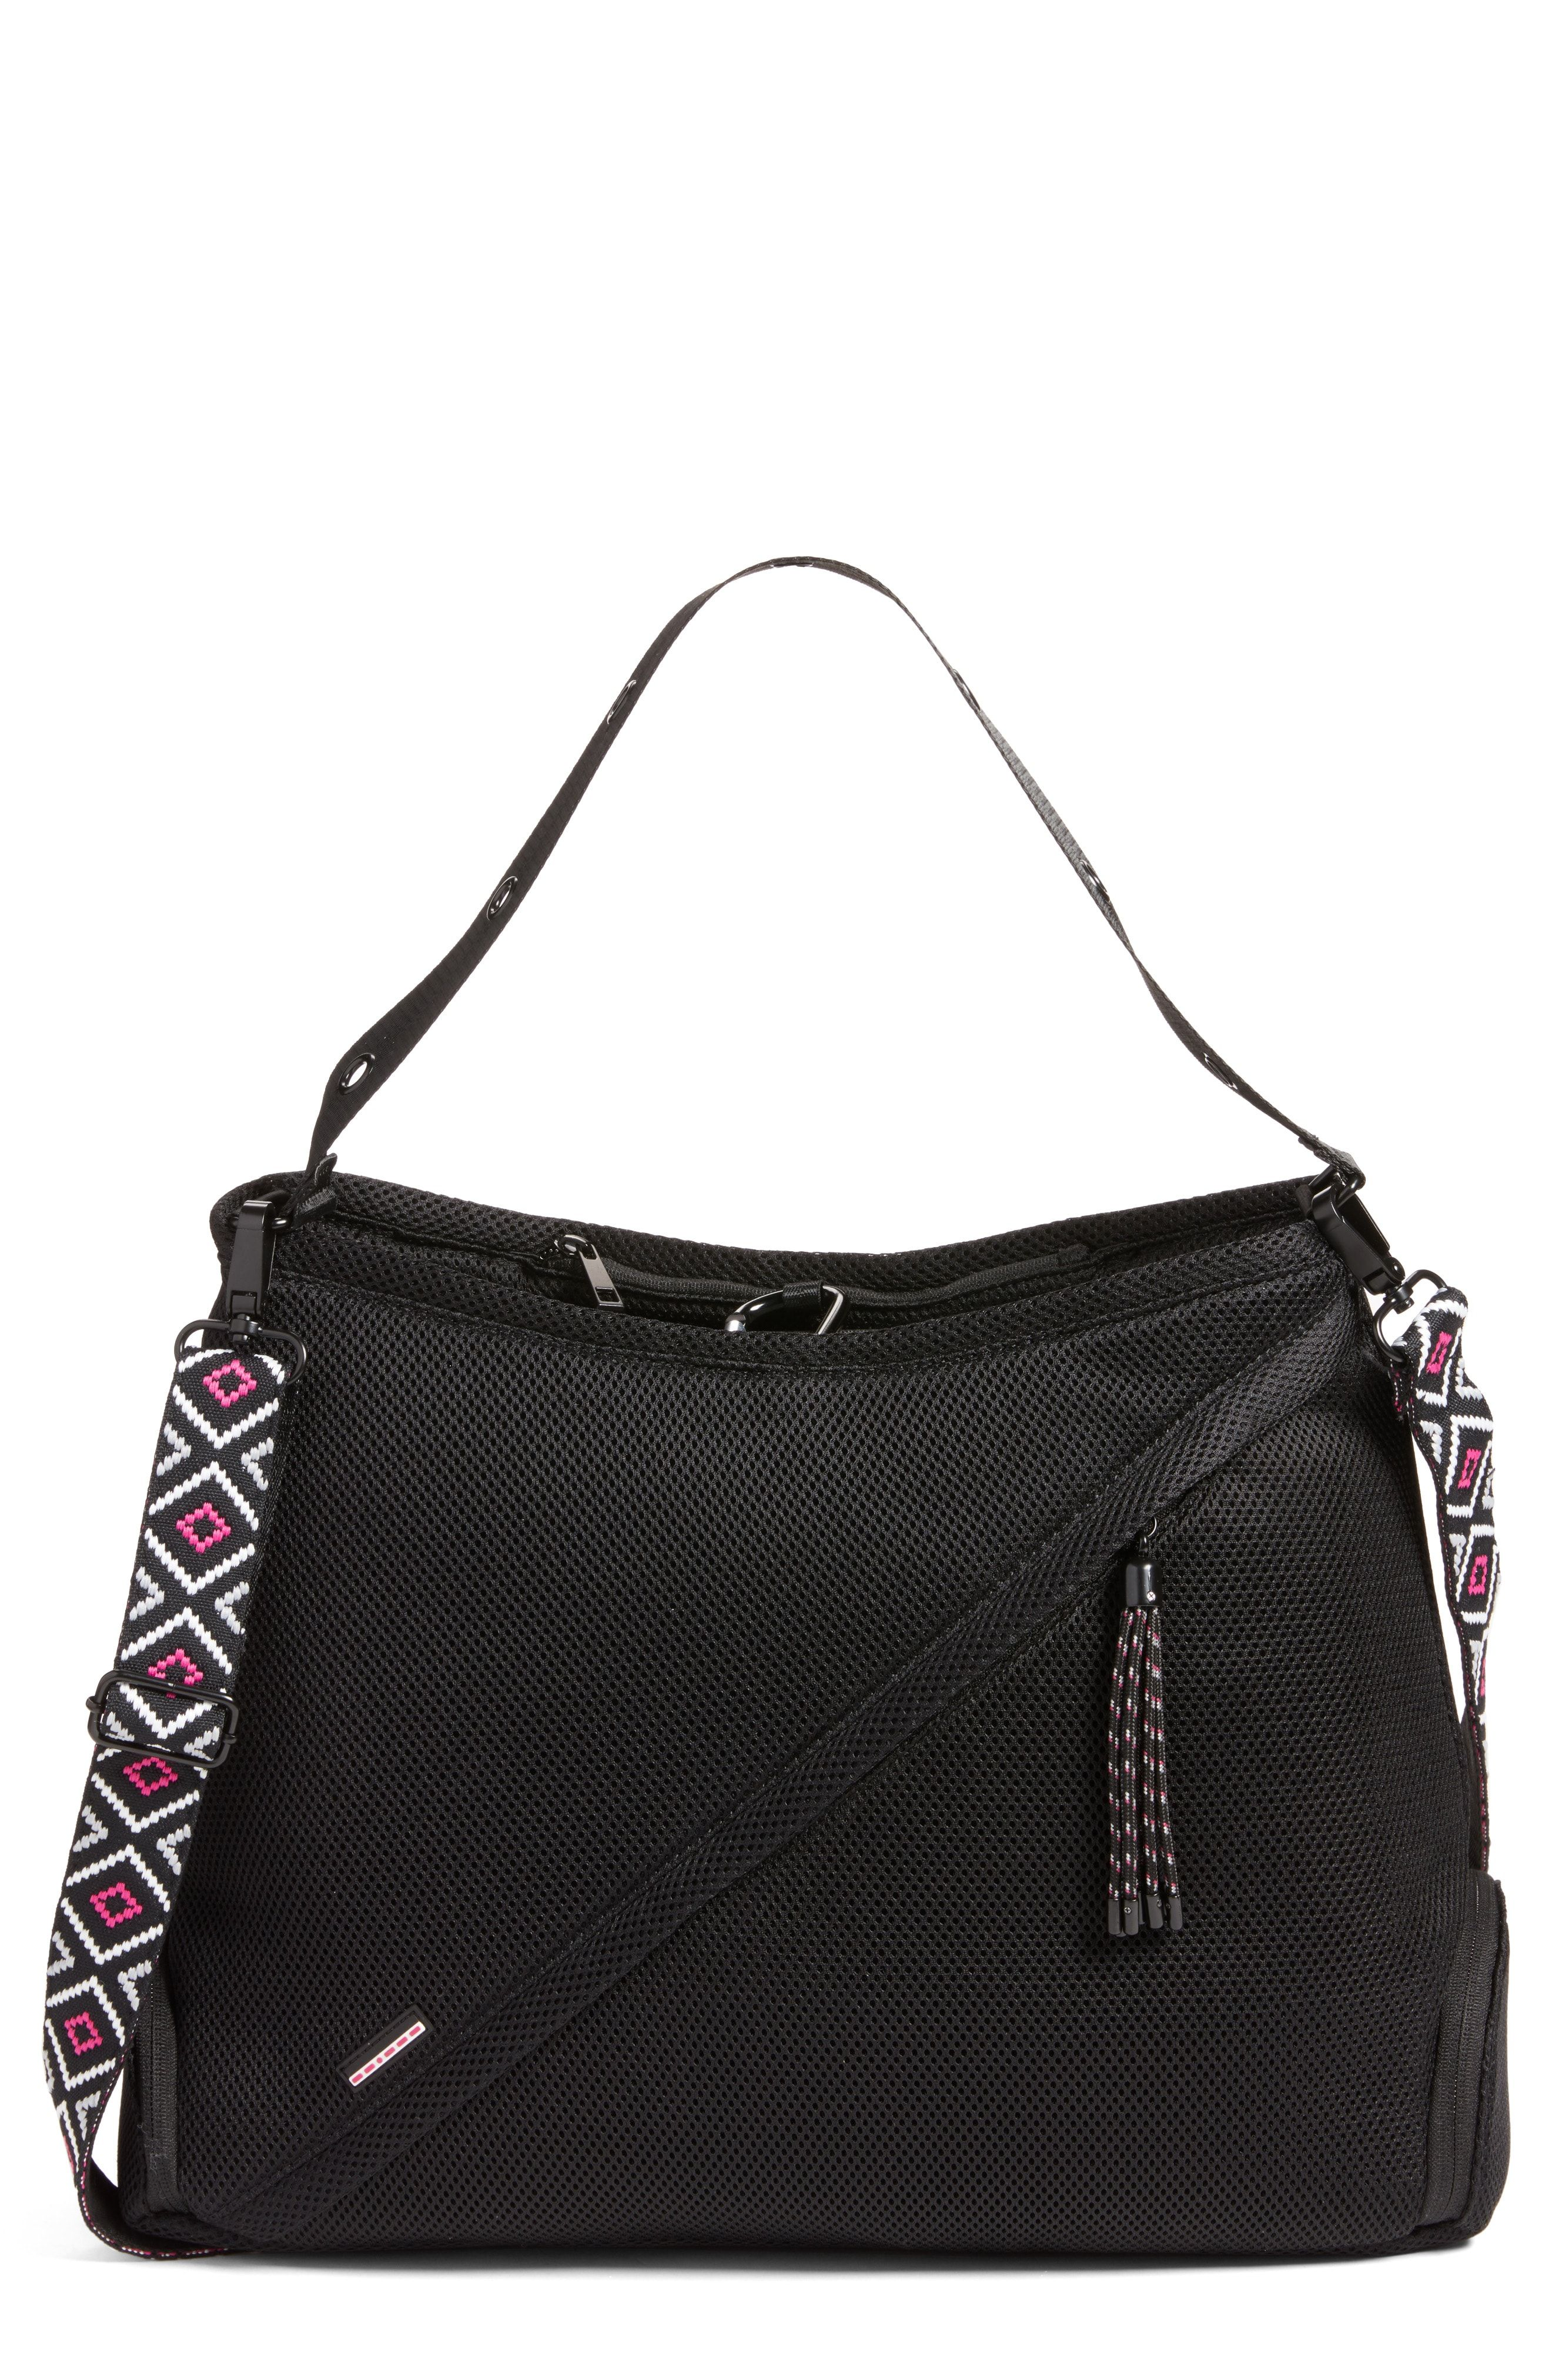 965ca49e77 11 Best Yoga Bags - Yoga Bags